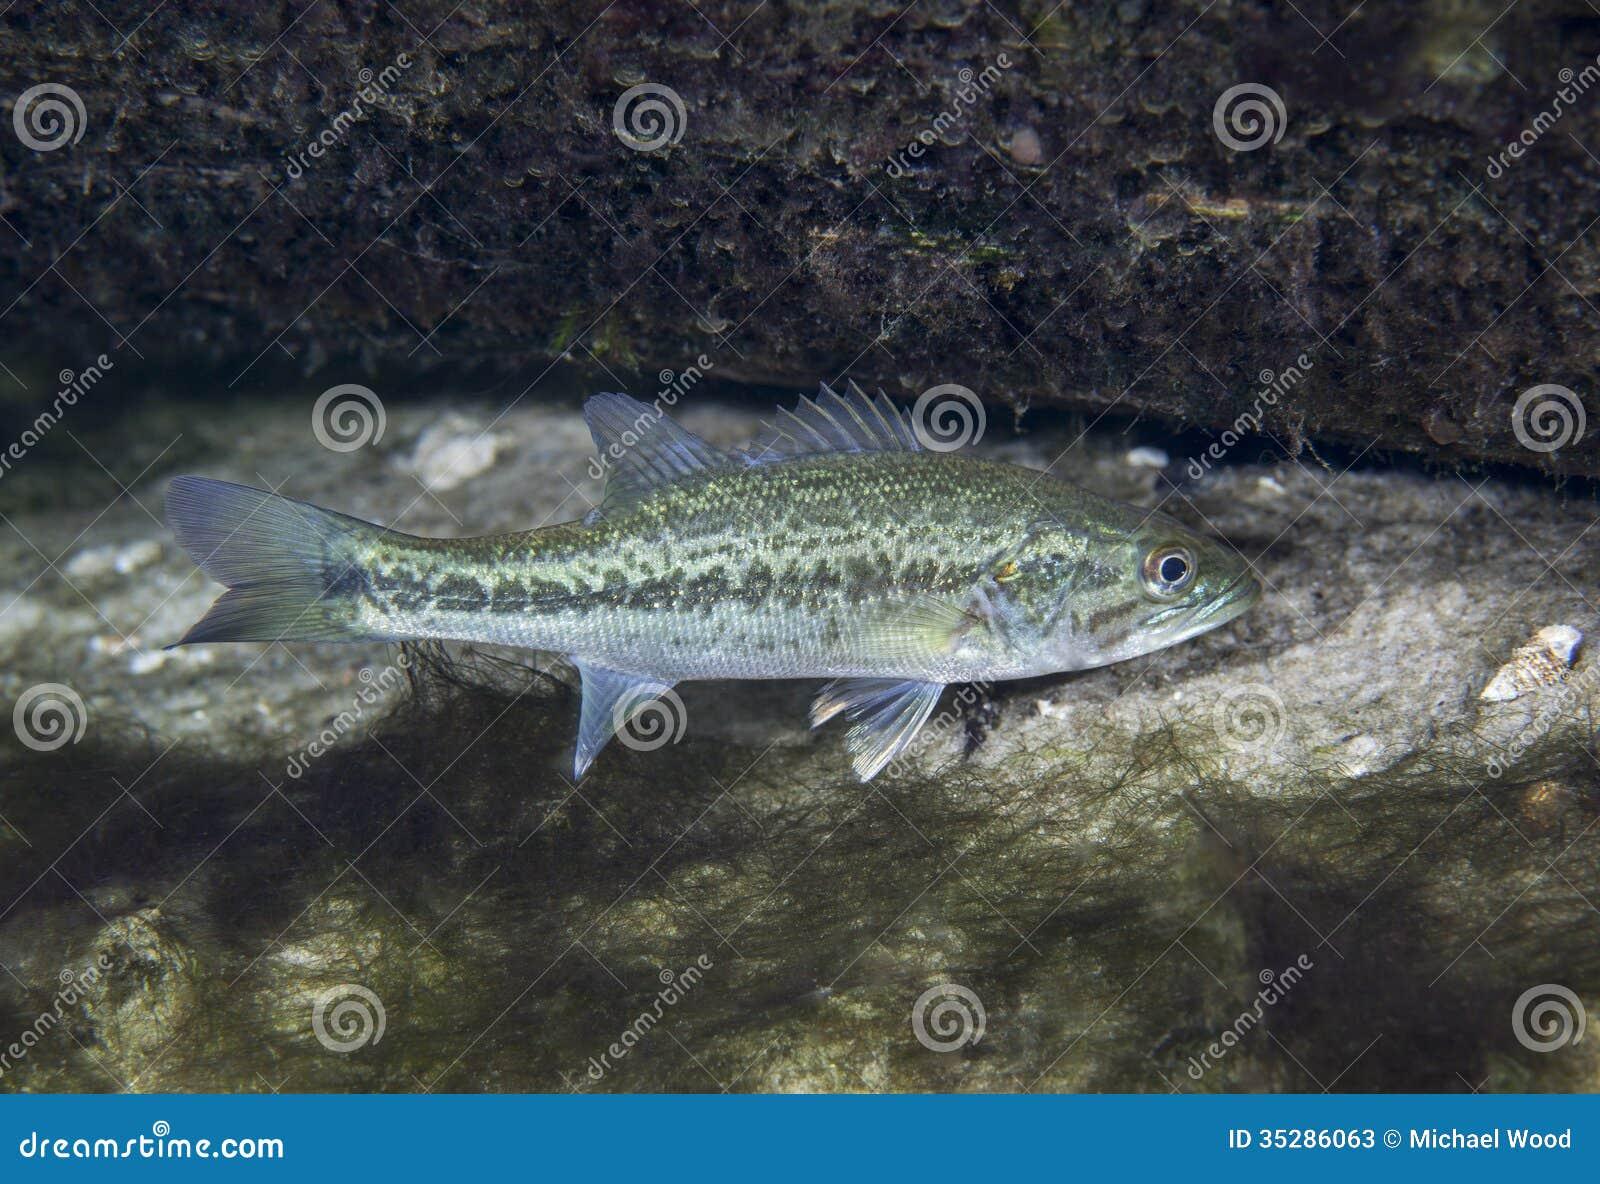 Spotted Bass Near Log